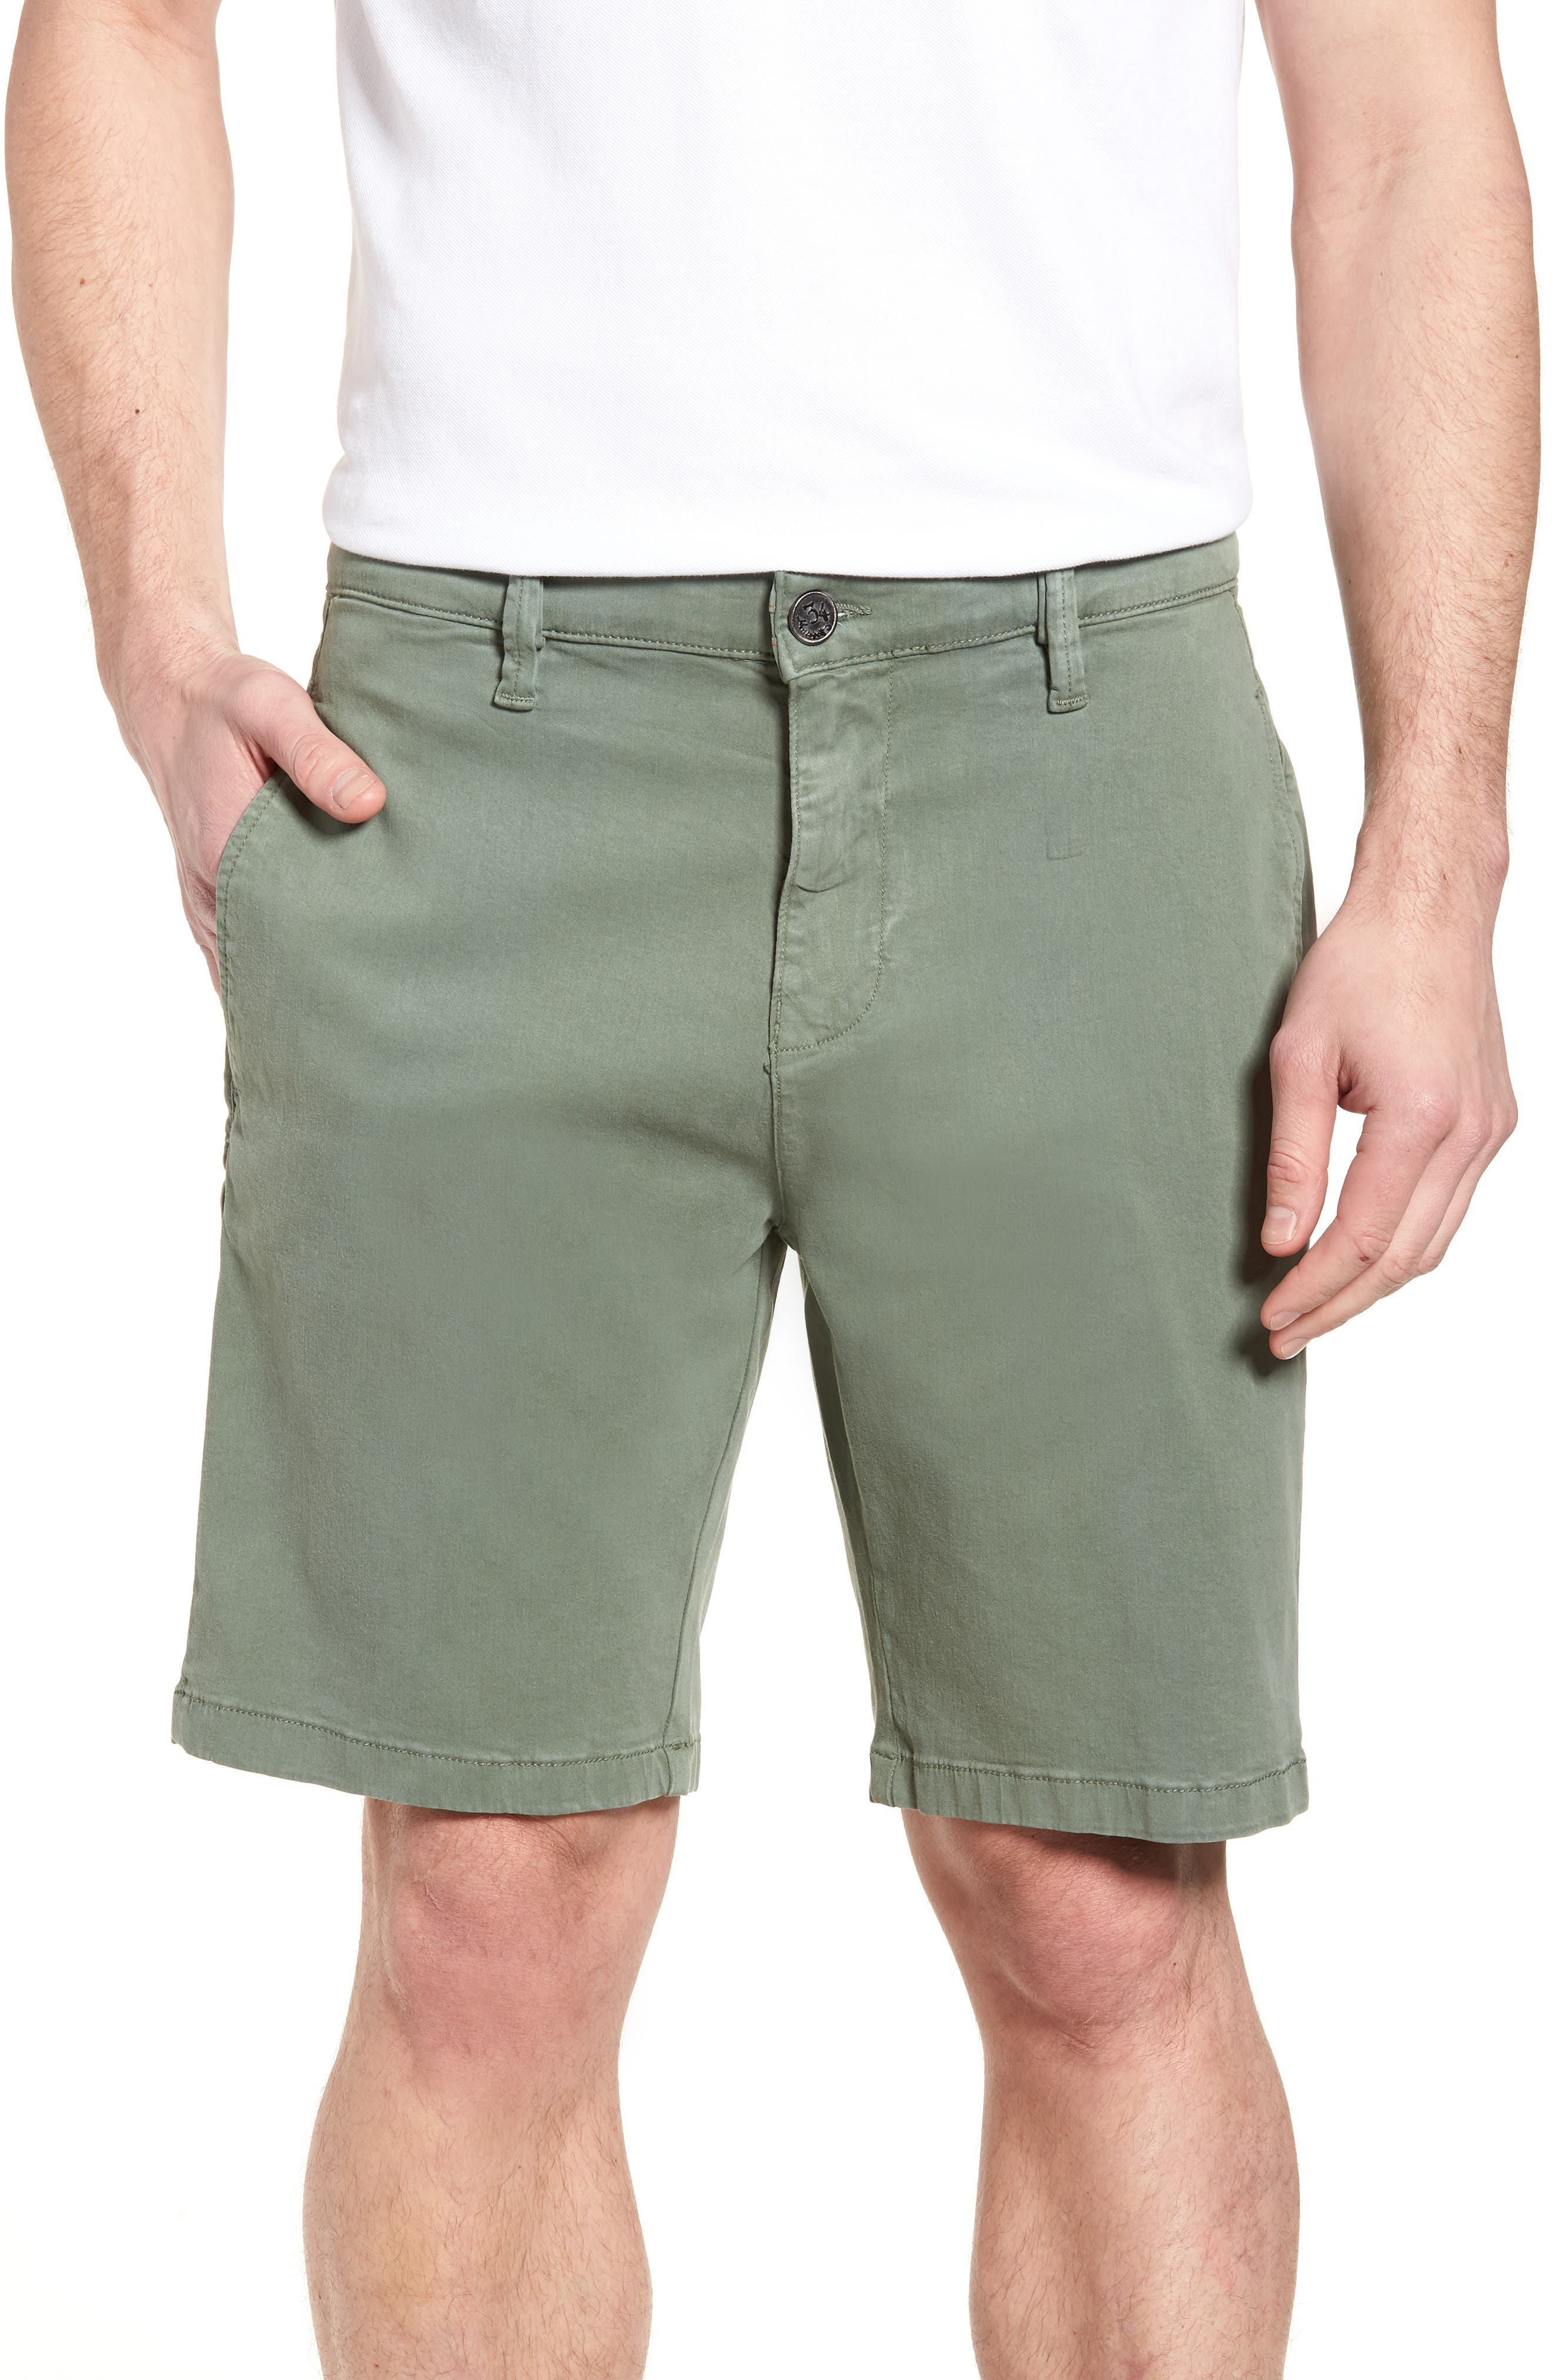 34 HERITAGE Nevada Twill Shorts, Main, color, MOSS TWILL